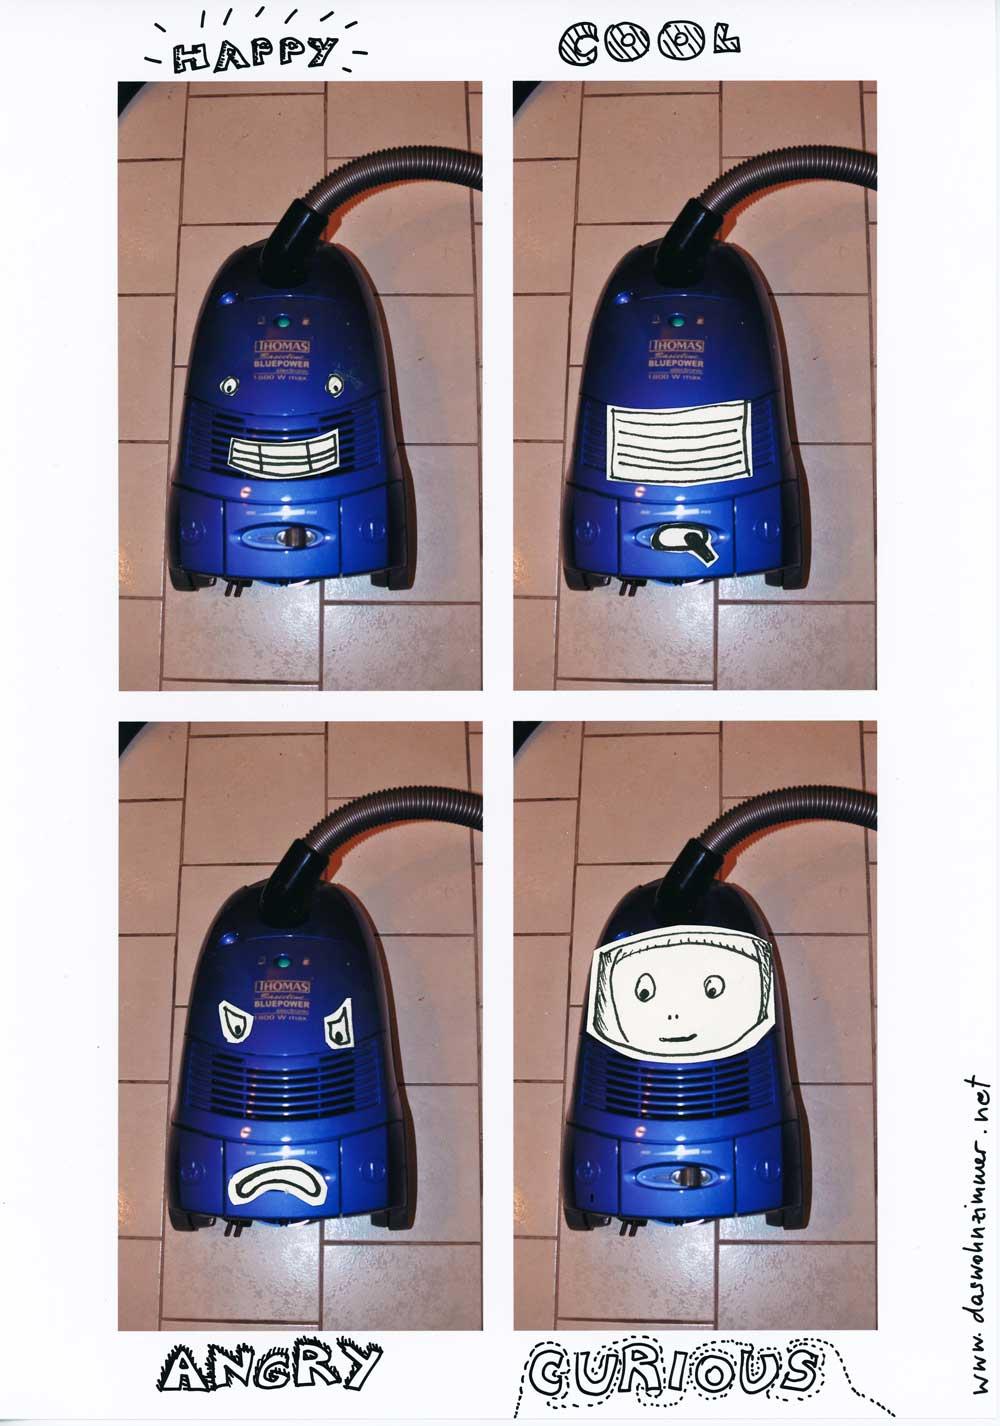 Be Creative #41 - Moody Vaccum cleaner, © Ines Häufler, 2011